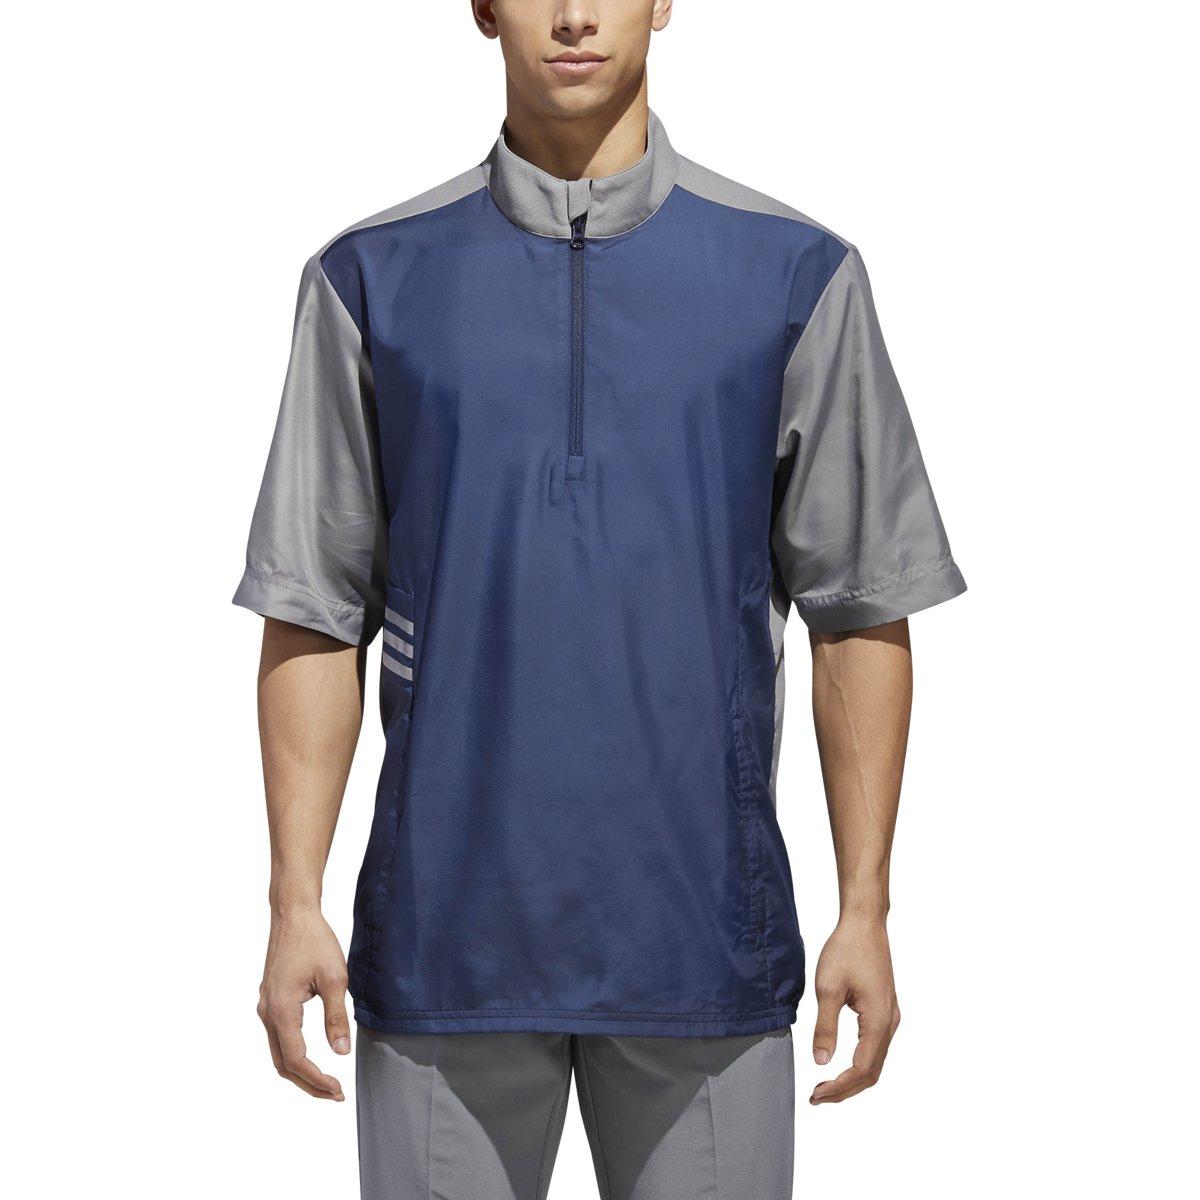 adidas Golf Club Short sleeve Wind Jacket, Collegiate Navy, X-Large